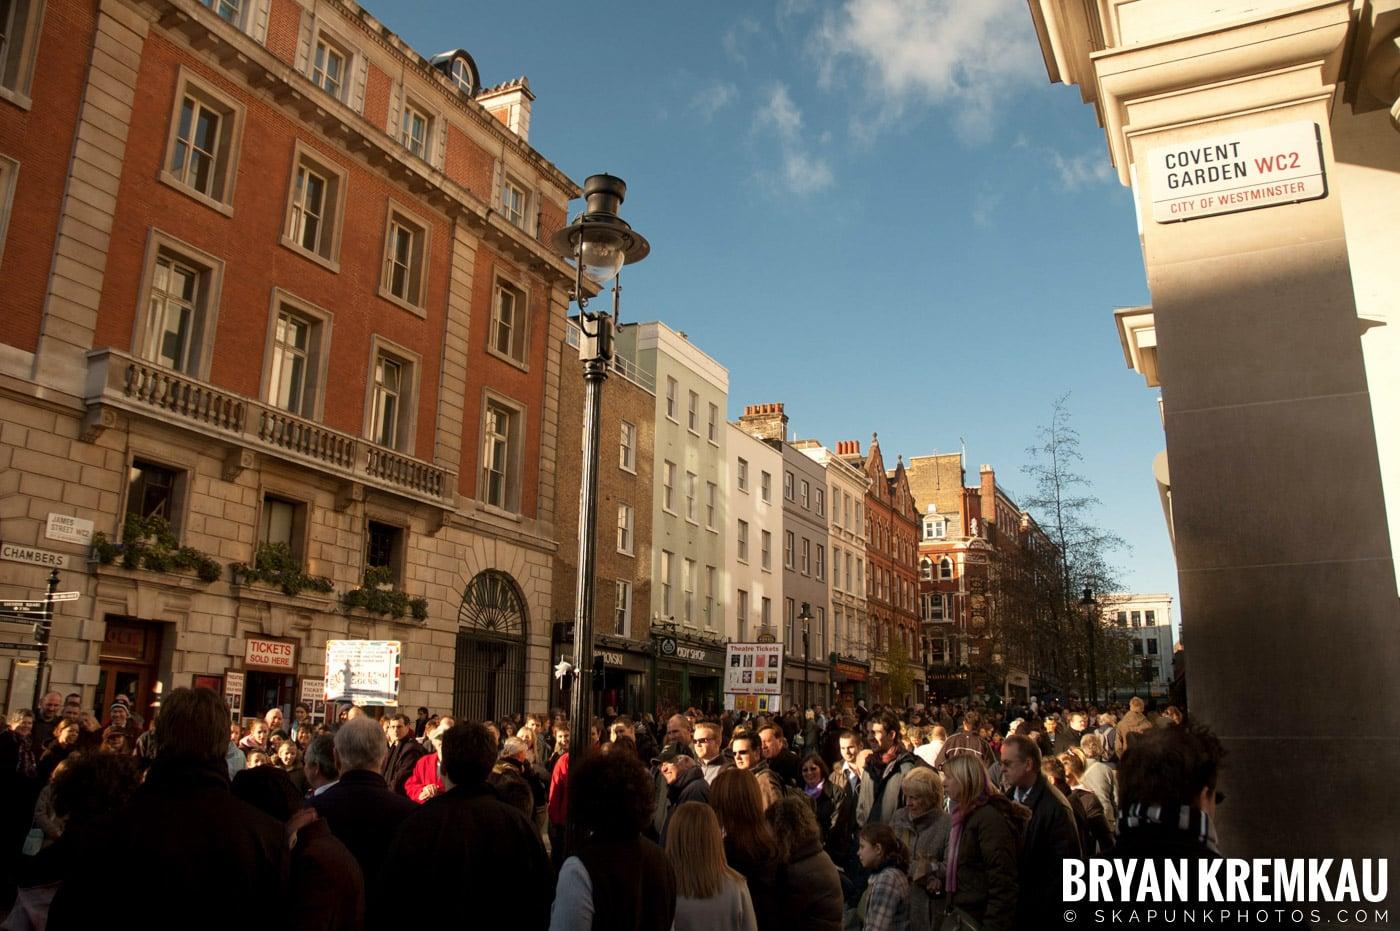 London, England - Day 5 - 12.17.06 (7)